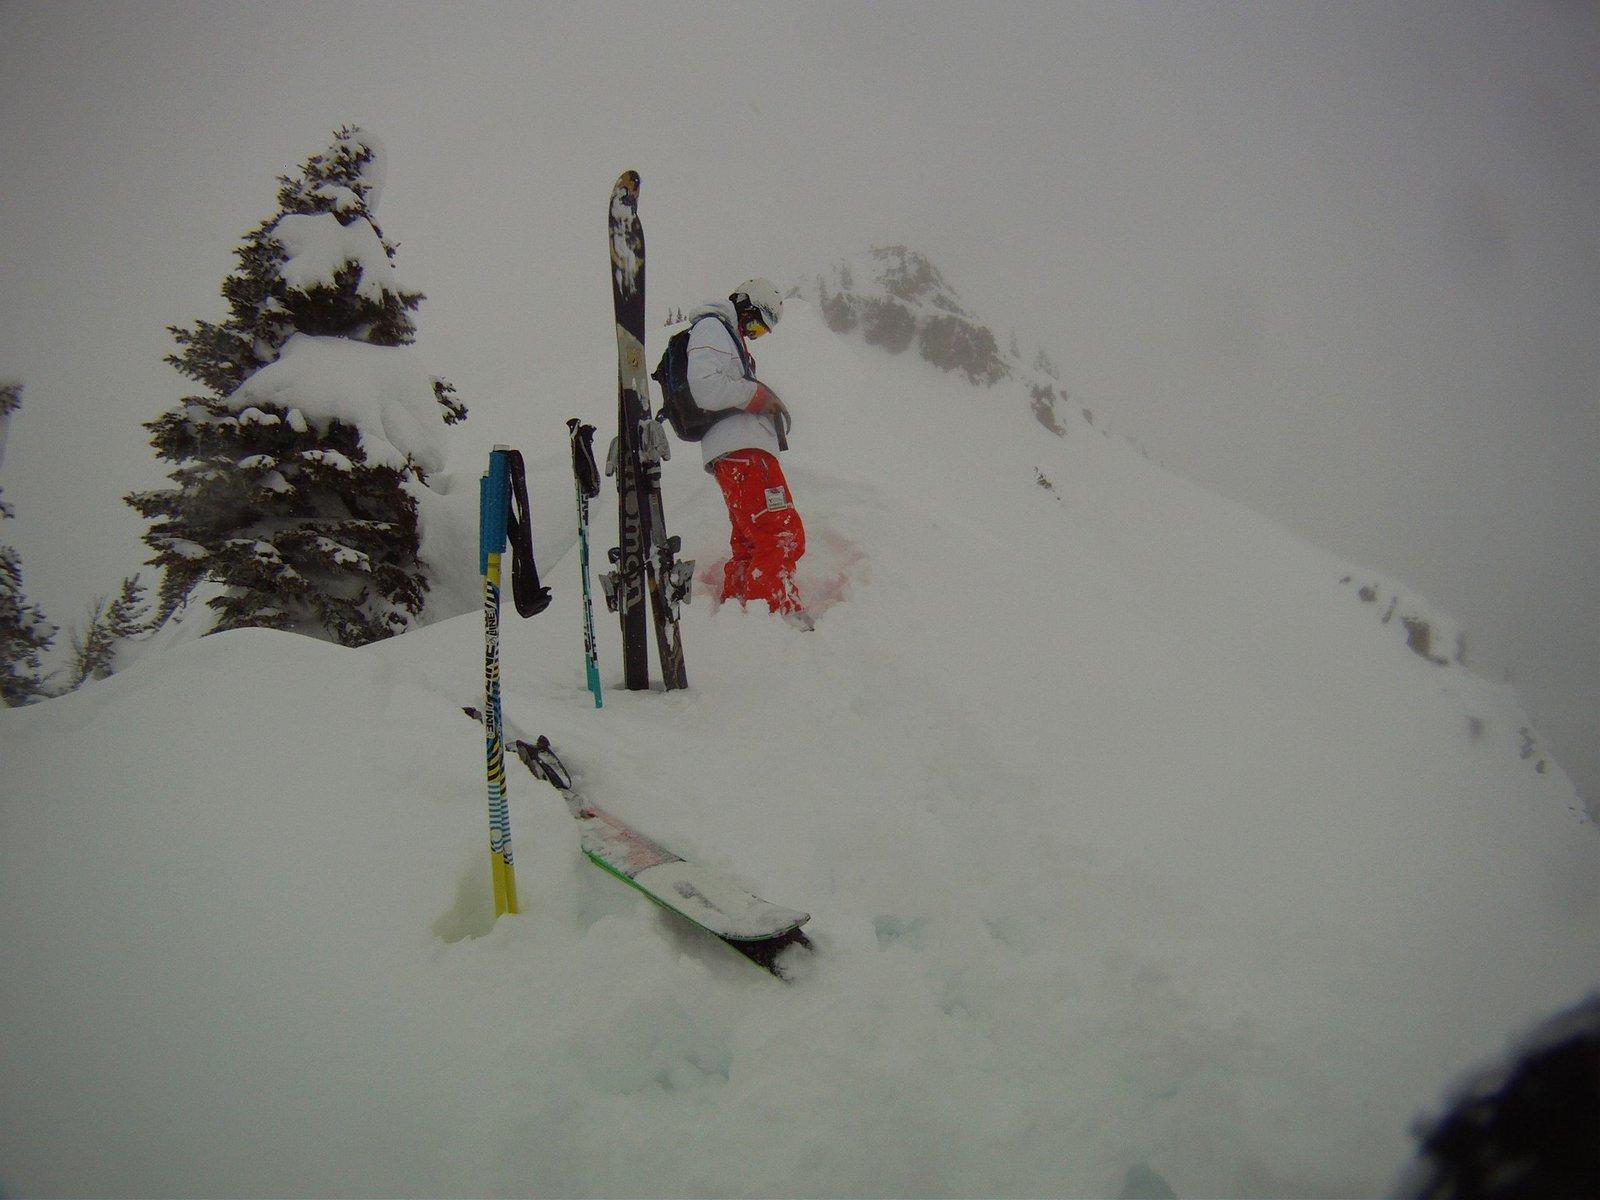 Skiin pow after long hike